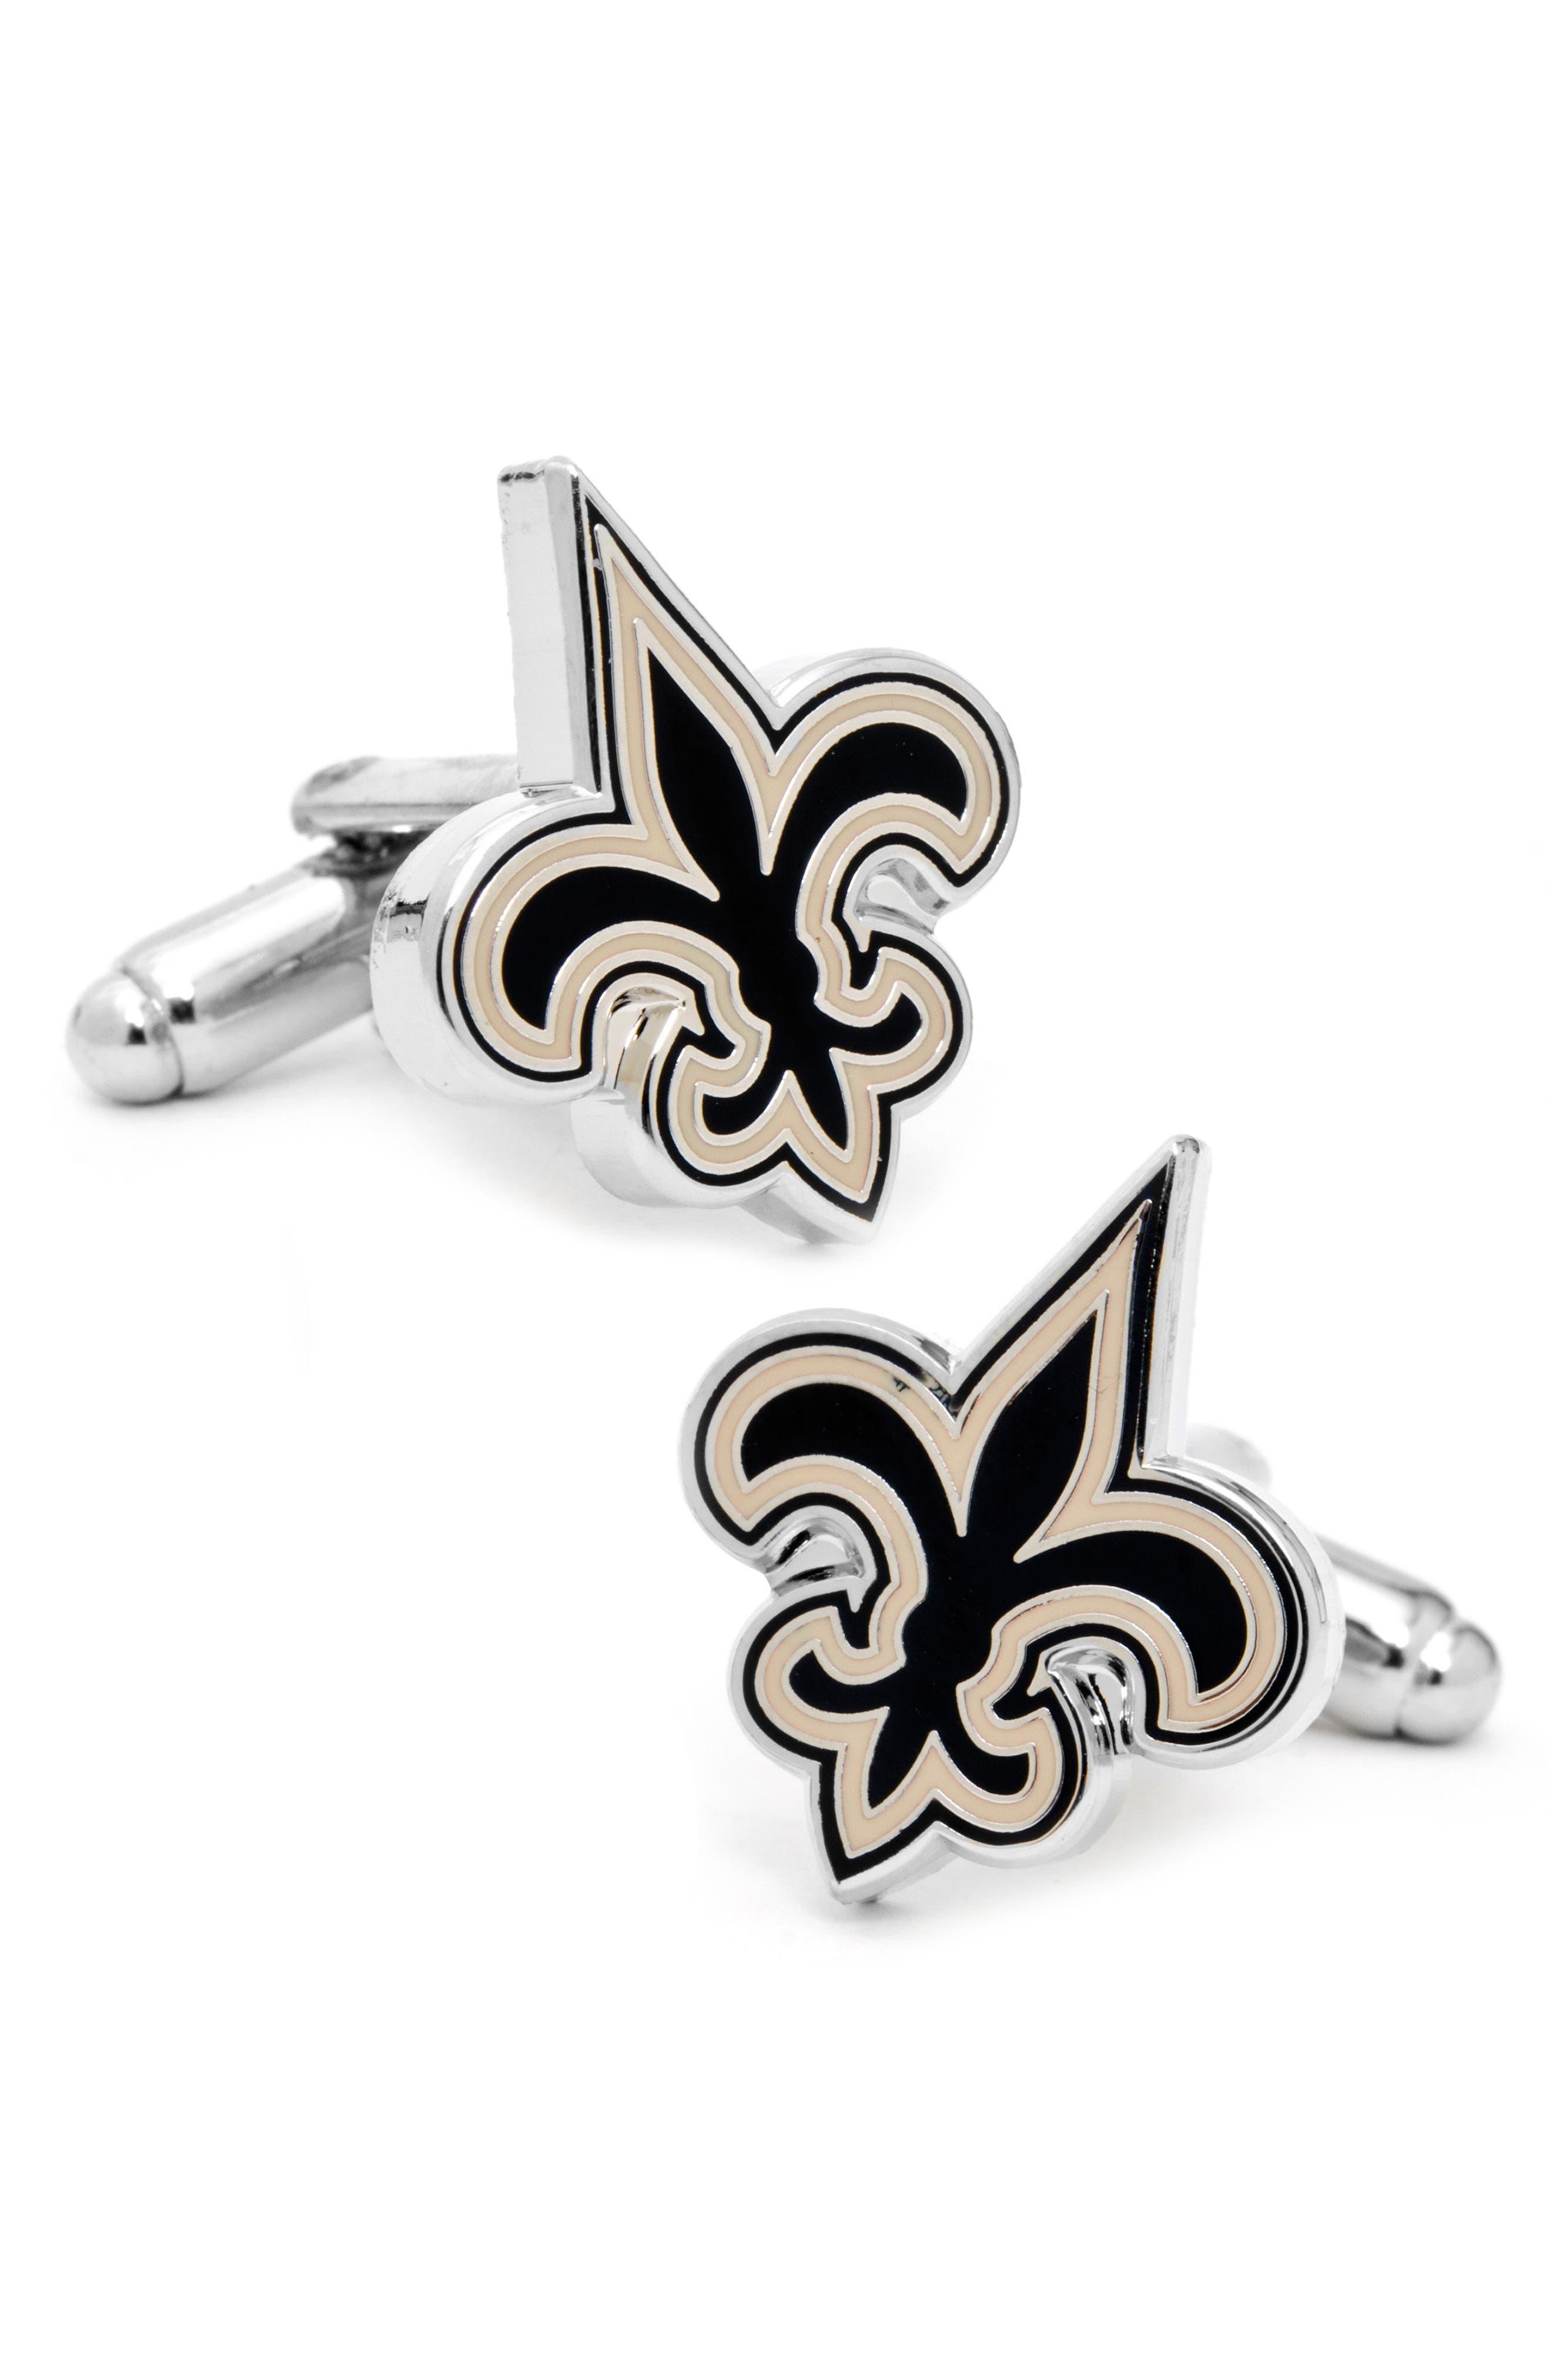 Cufflinks Inc. New Orleans Saints Cuff Links,                         Main,                         color, Black/ Gold